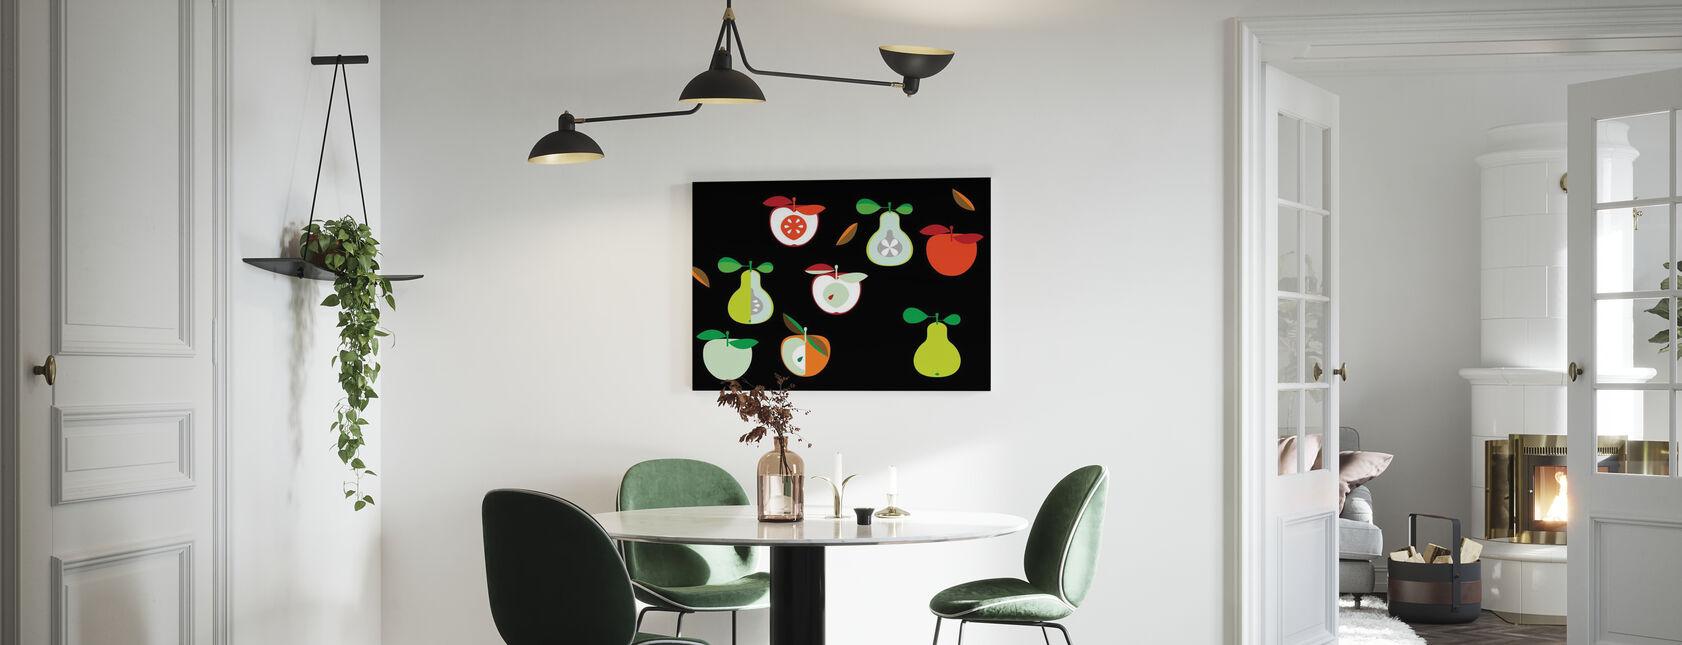 Kivik Omena ja päärynä - Canvastaulu - Keittiö